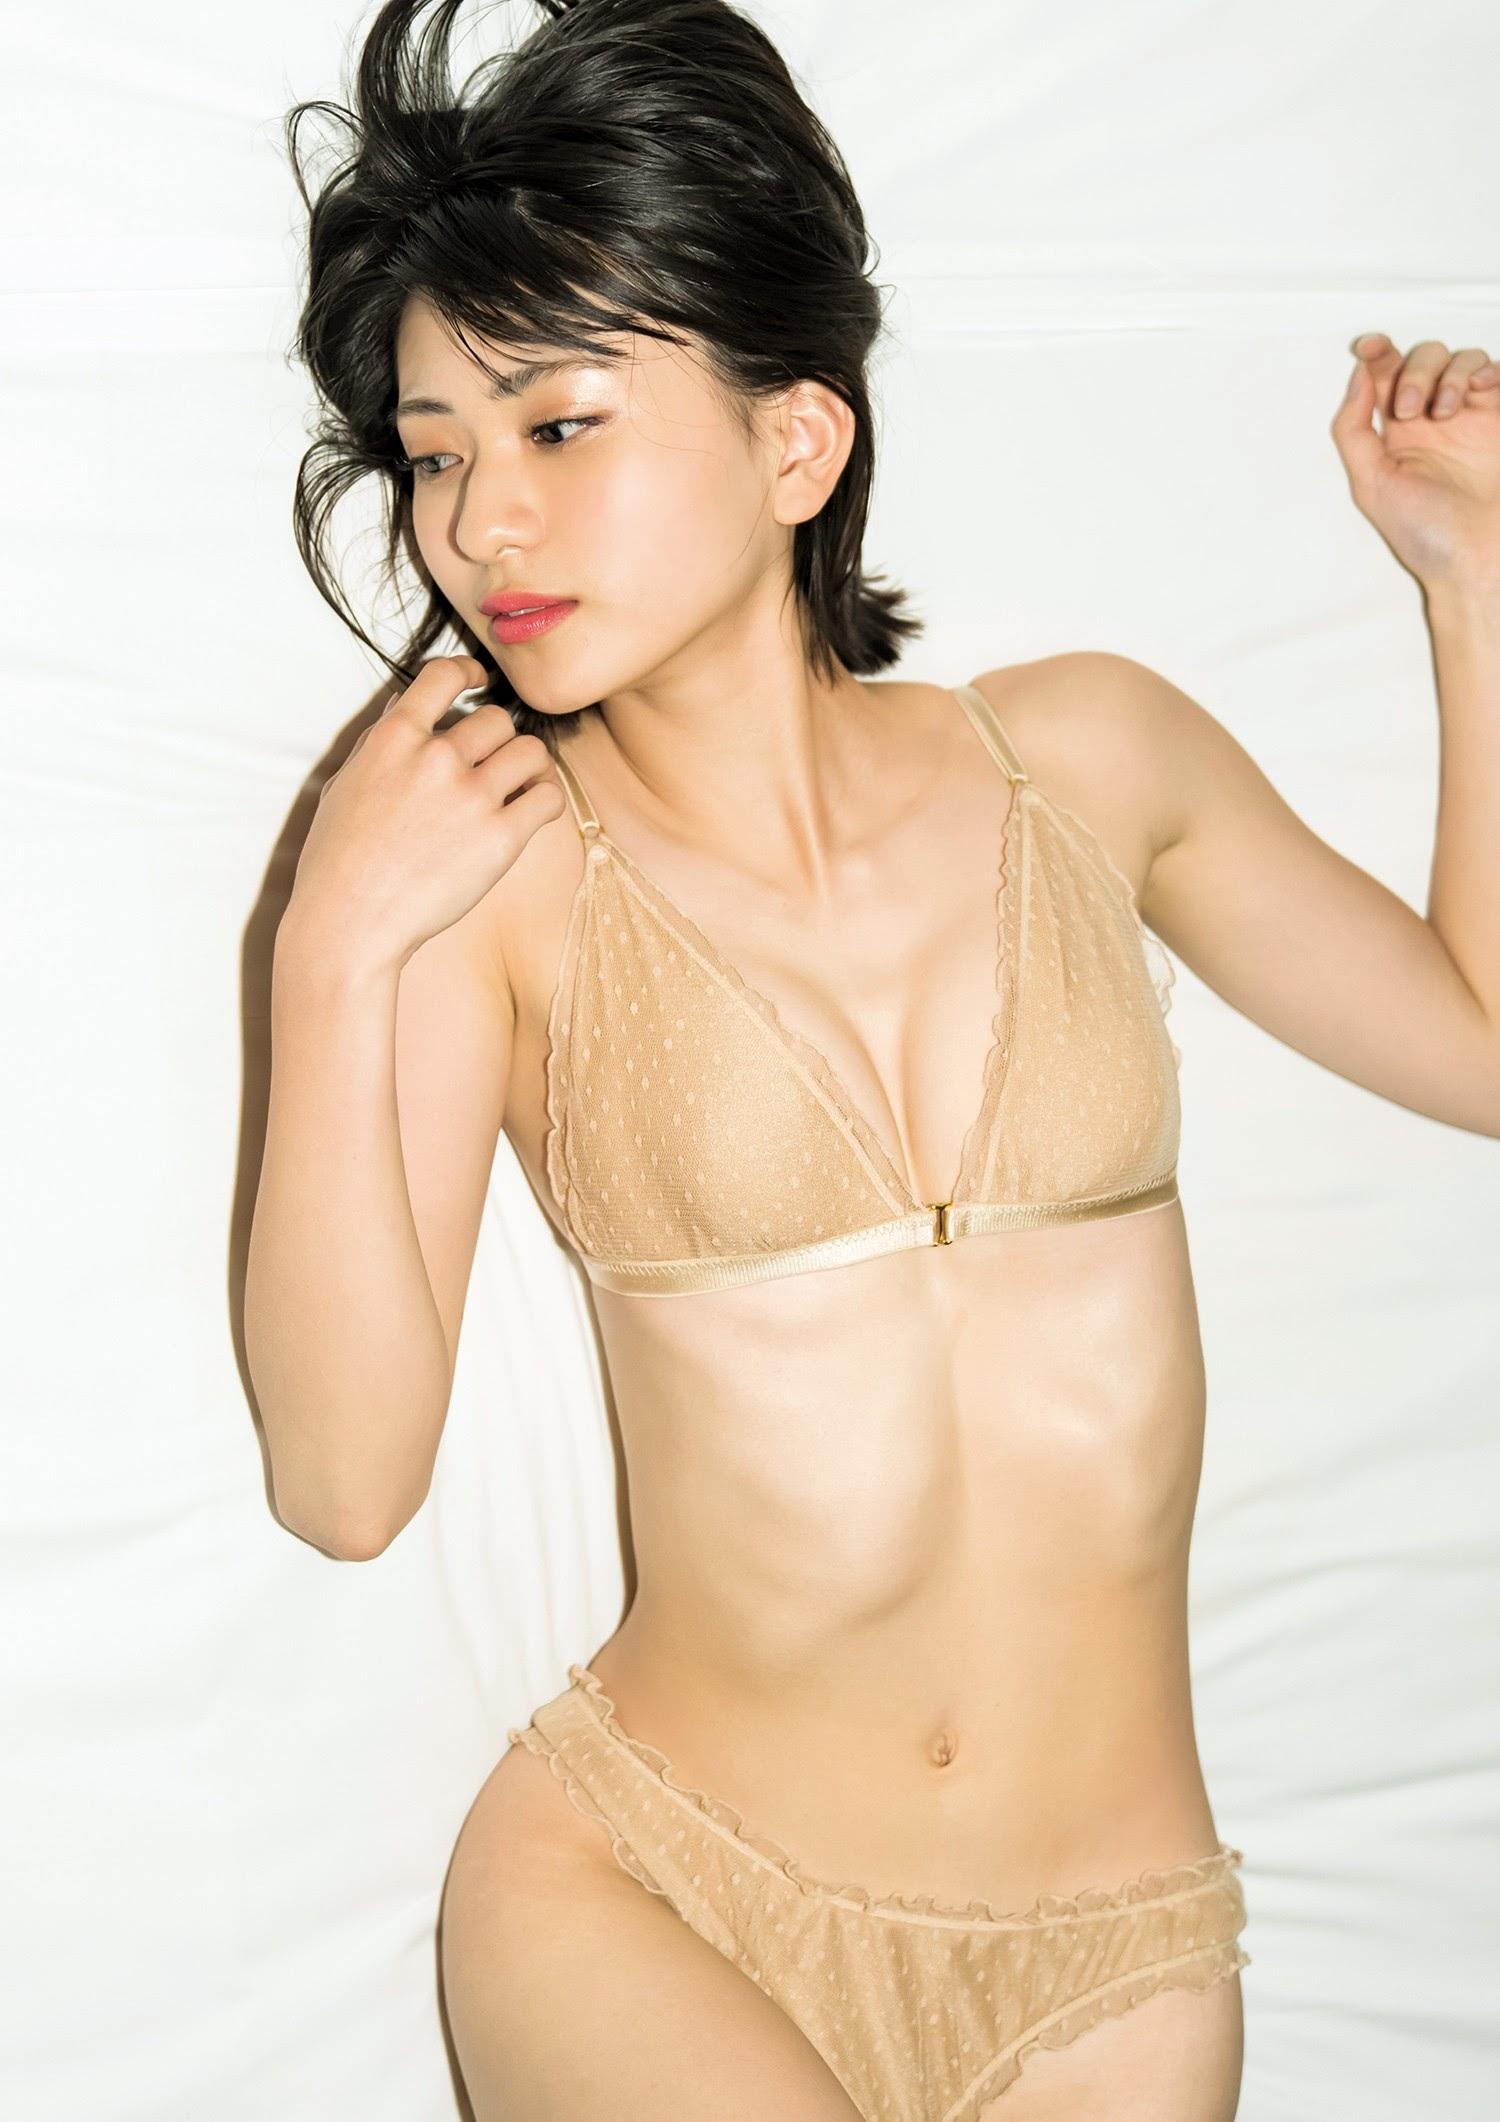 nanami yamada 2020096